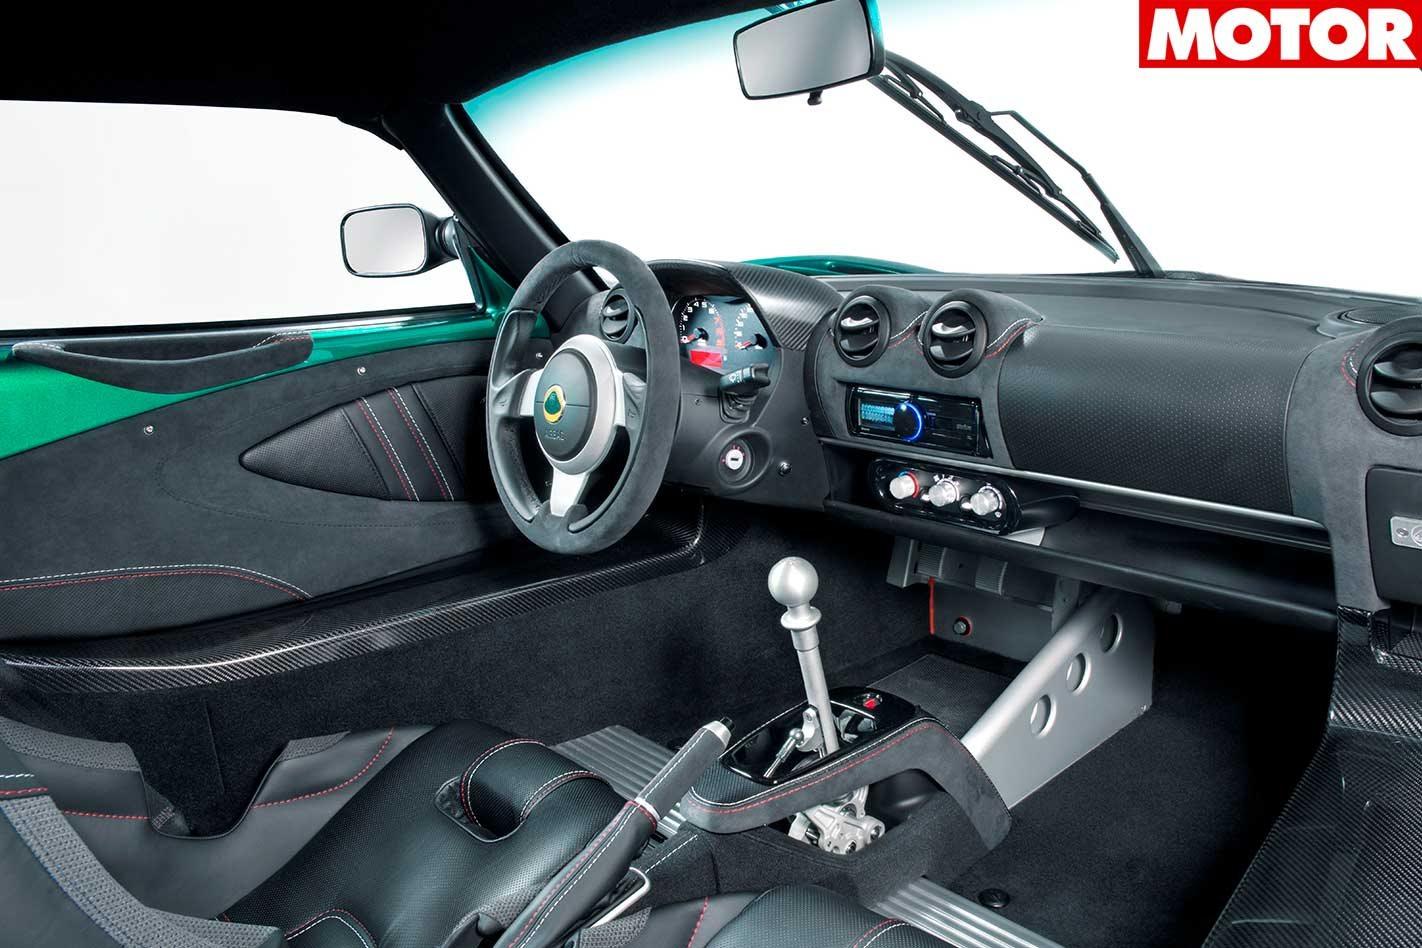 https://d3lp4xedbqa8a5.cloudfront.net/s3/digital-cougar-assets/motor/2018/03/28/Misc/Lotus-Evora-GT430-and-GT430-Sport-interior.jpg